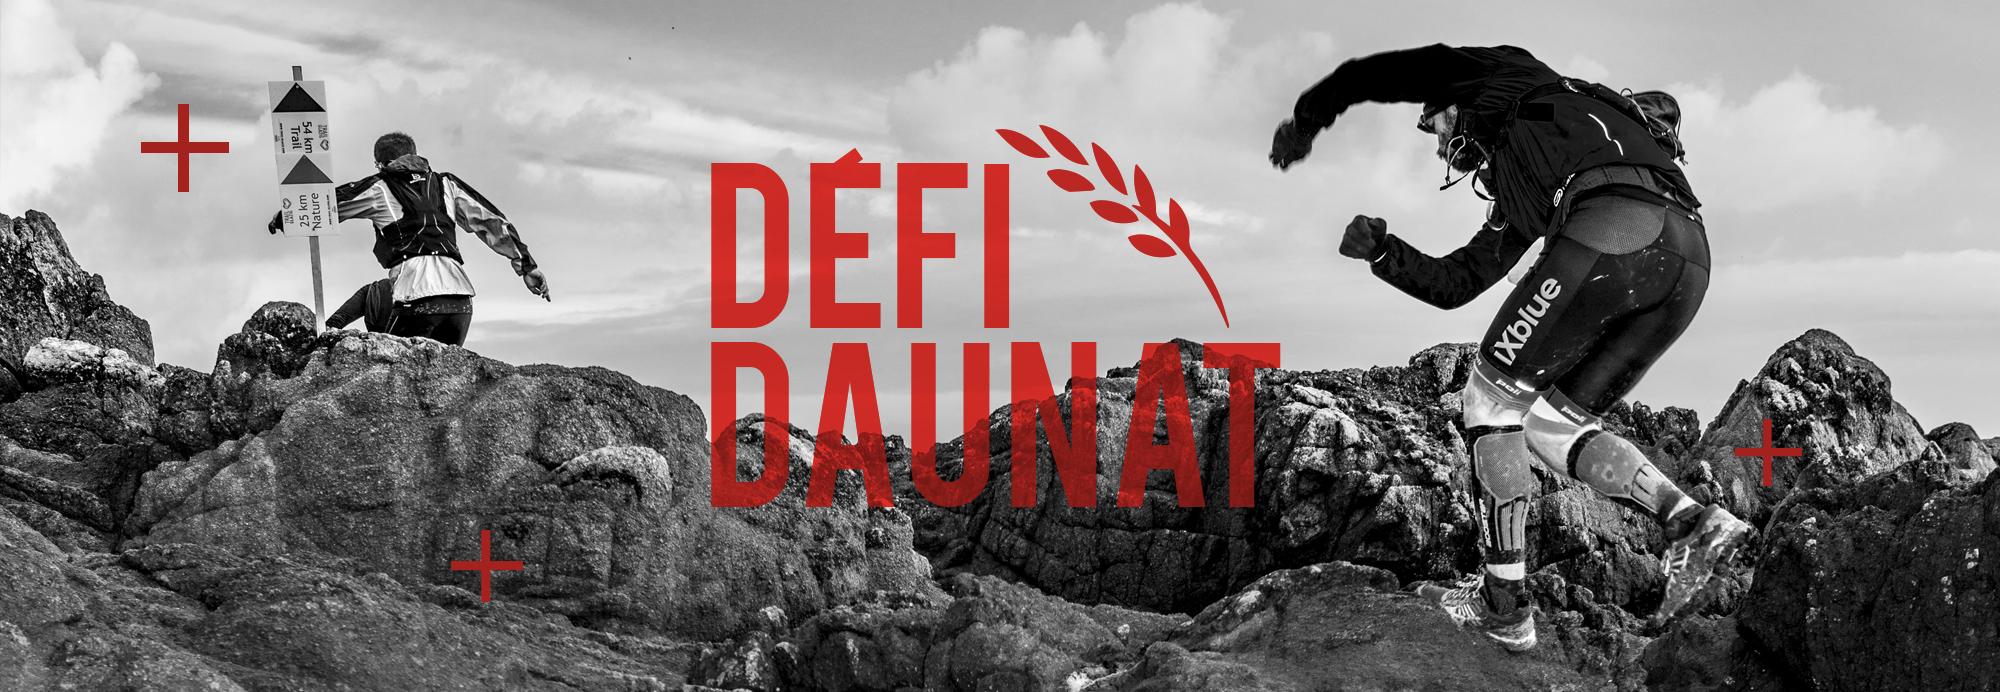 banner-defi_Daunat